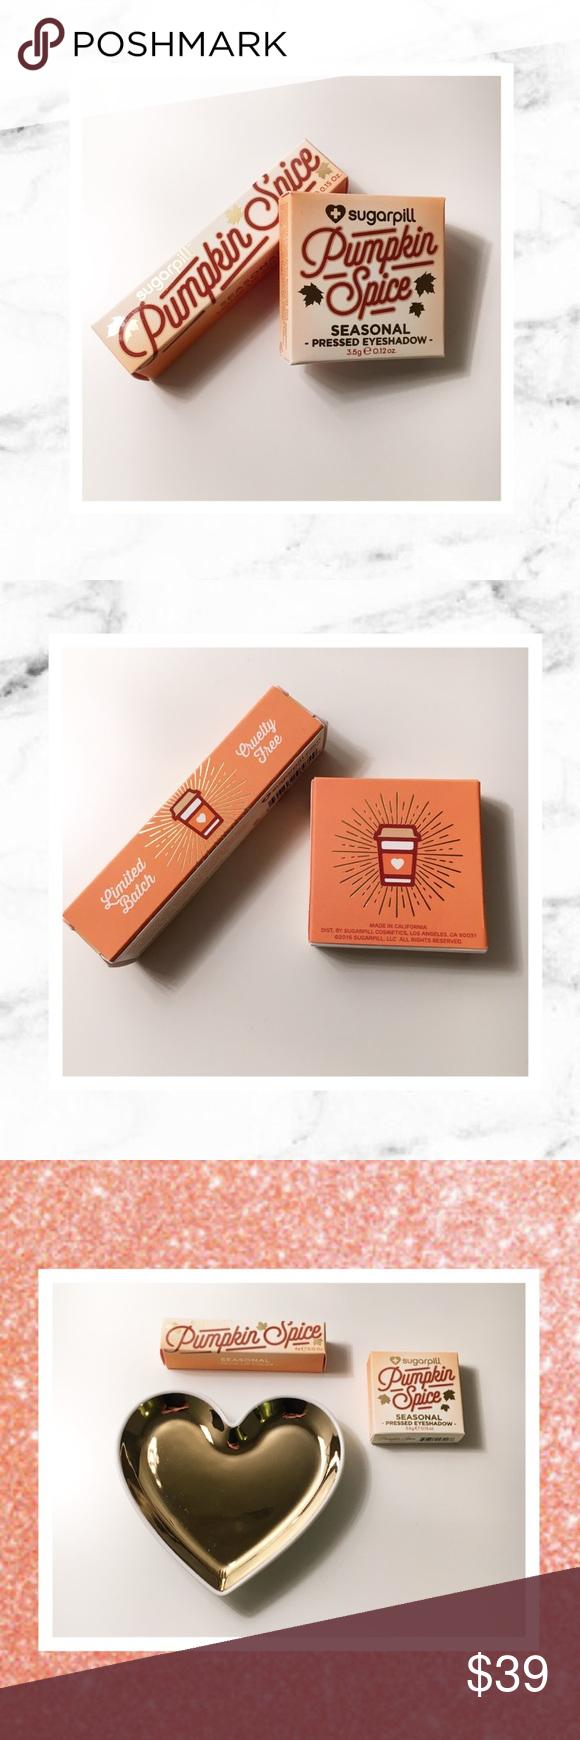 💕🎀Sugarpill 💎🌷 Pumpkin Spice Sugarpill Limited Edition Pumpkin Spice liquid lipstick and eyeshadow. New in box never used, never swatched. Soooo cute! 💎🎀💕 Sugarpill Makeup Eyeshadow